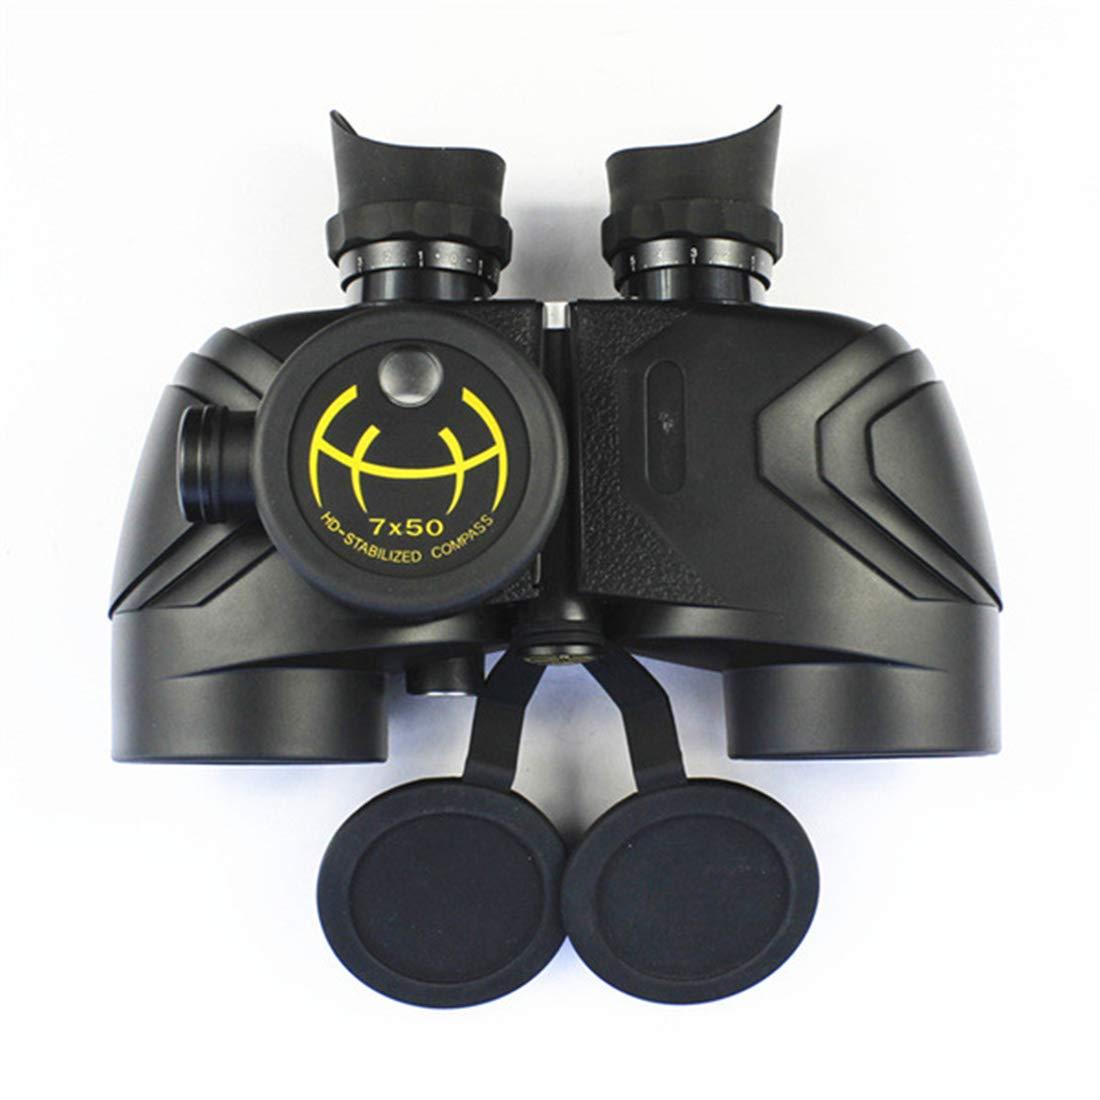 JULYFELICIA Binoculars 7x50 HD Binoculars with Compass Waterproof Nautical Telescope for Outdoor Use (Color : Black)